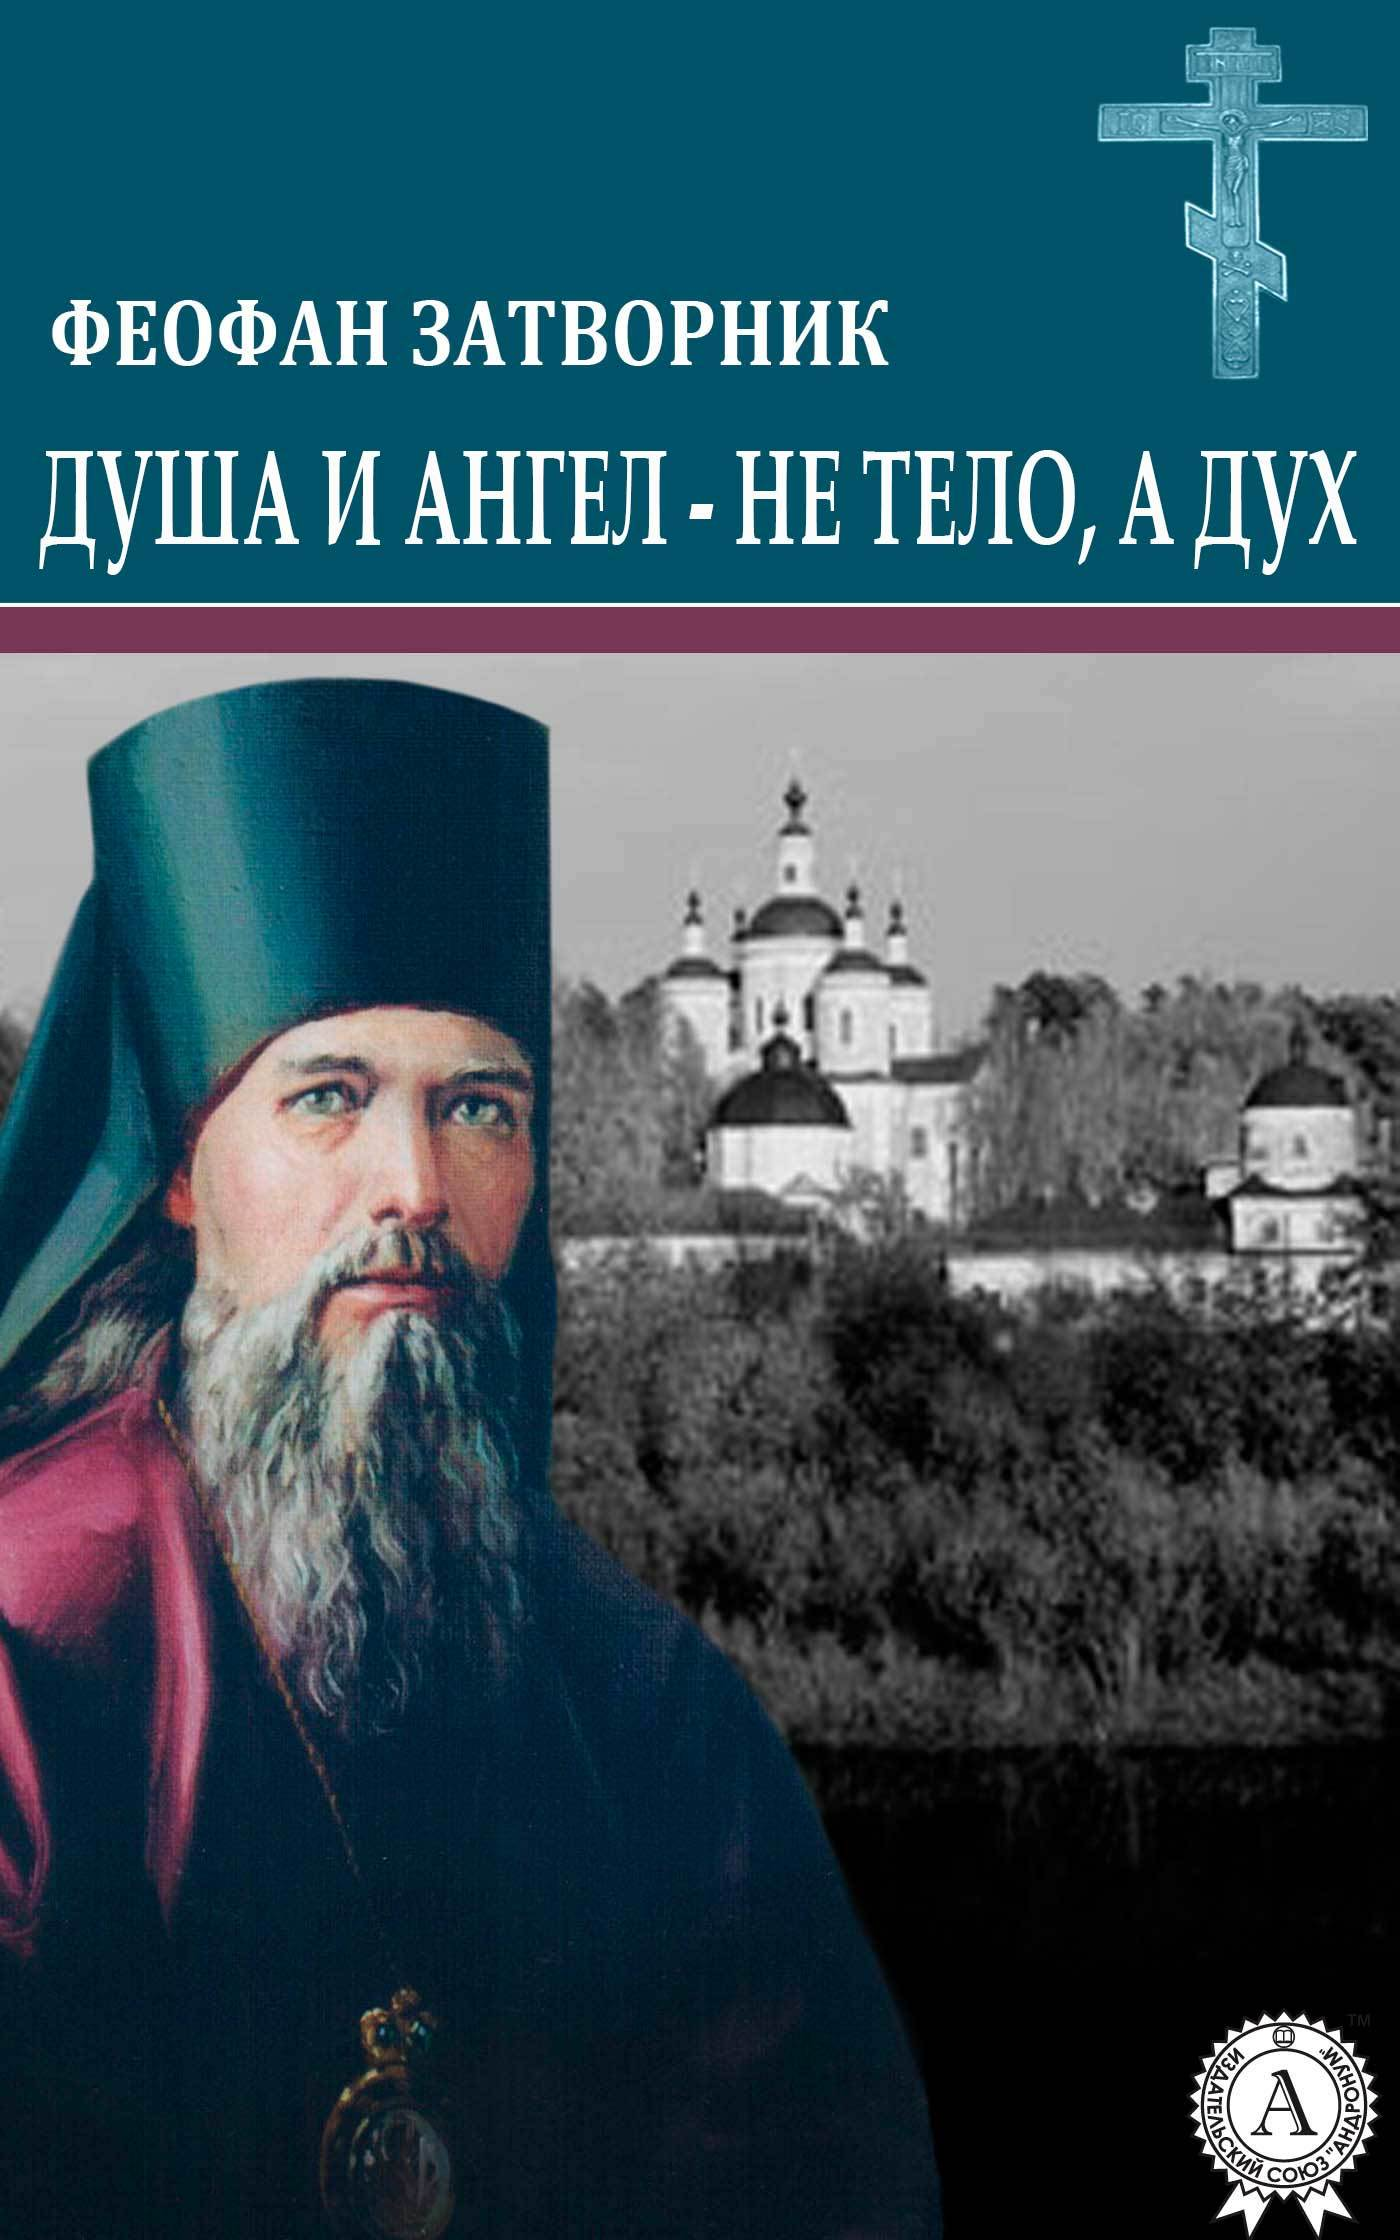 cвятитель Феофан Затворник Душа и ангел – не тело, а дух